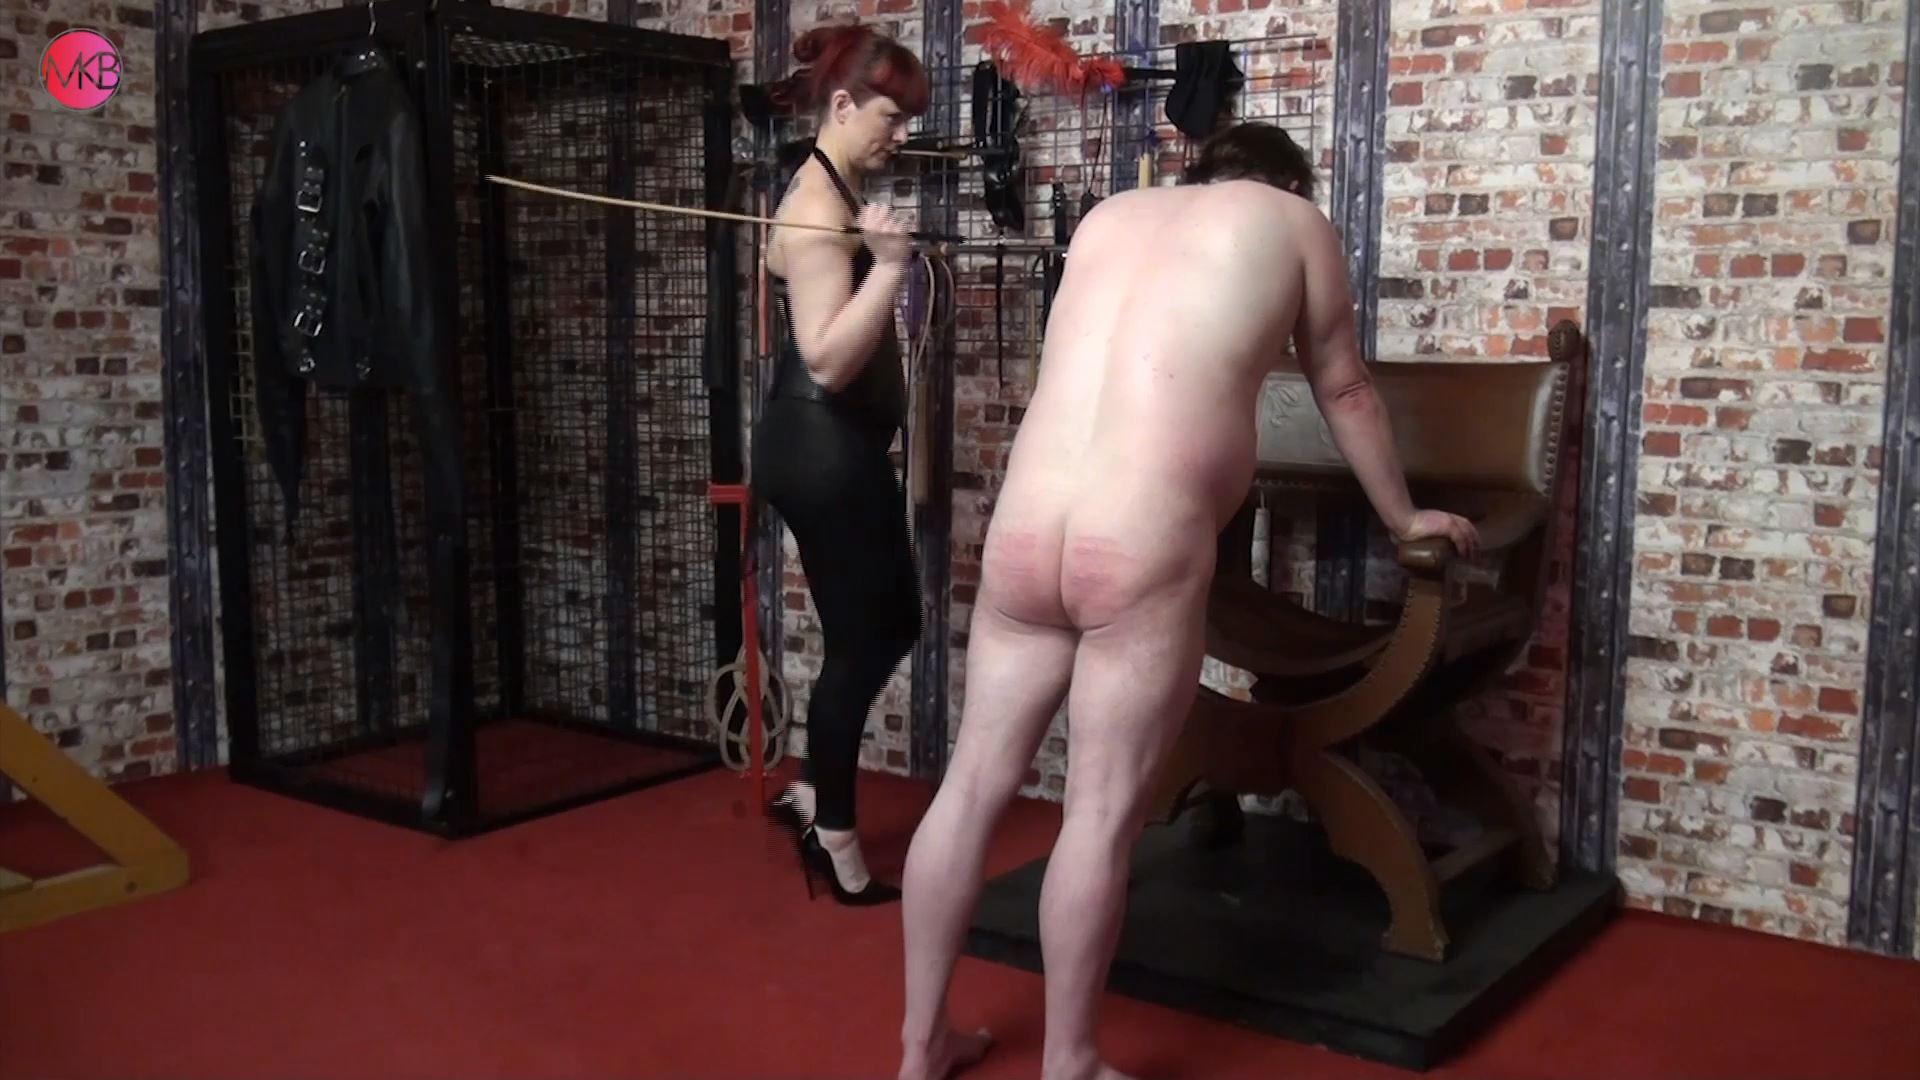 Stern Punishment - MISS KITTY BLISS - FULL HD/1080p/MP4